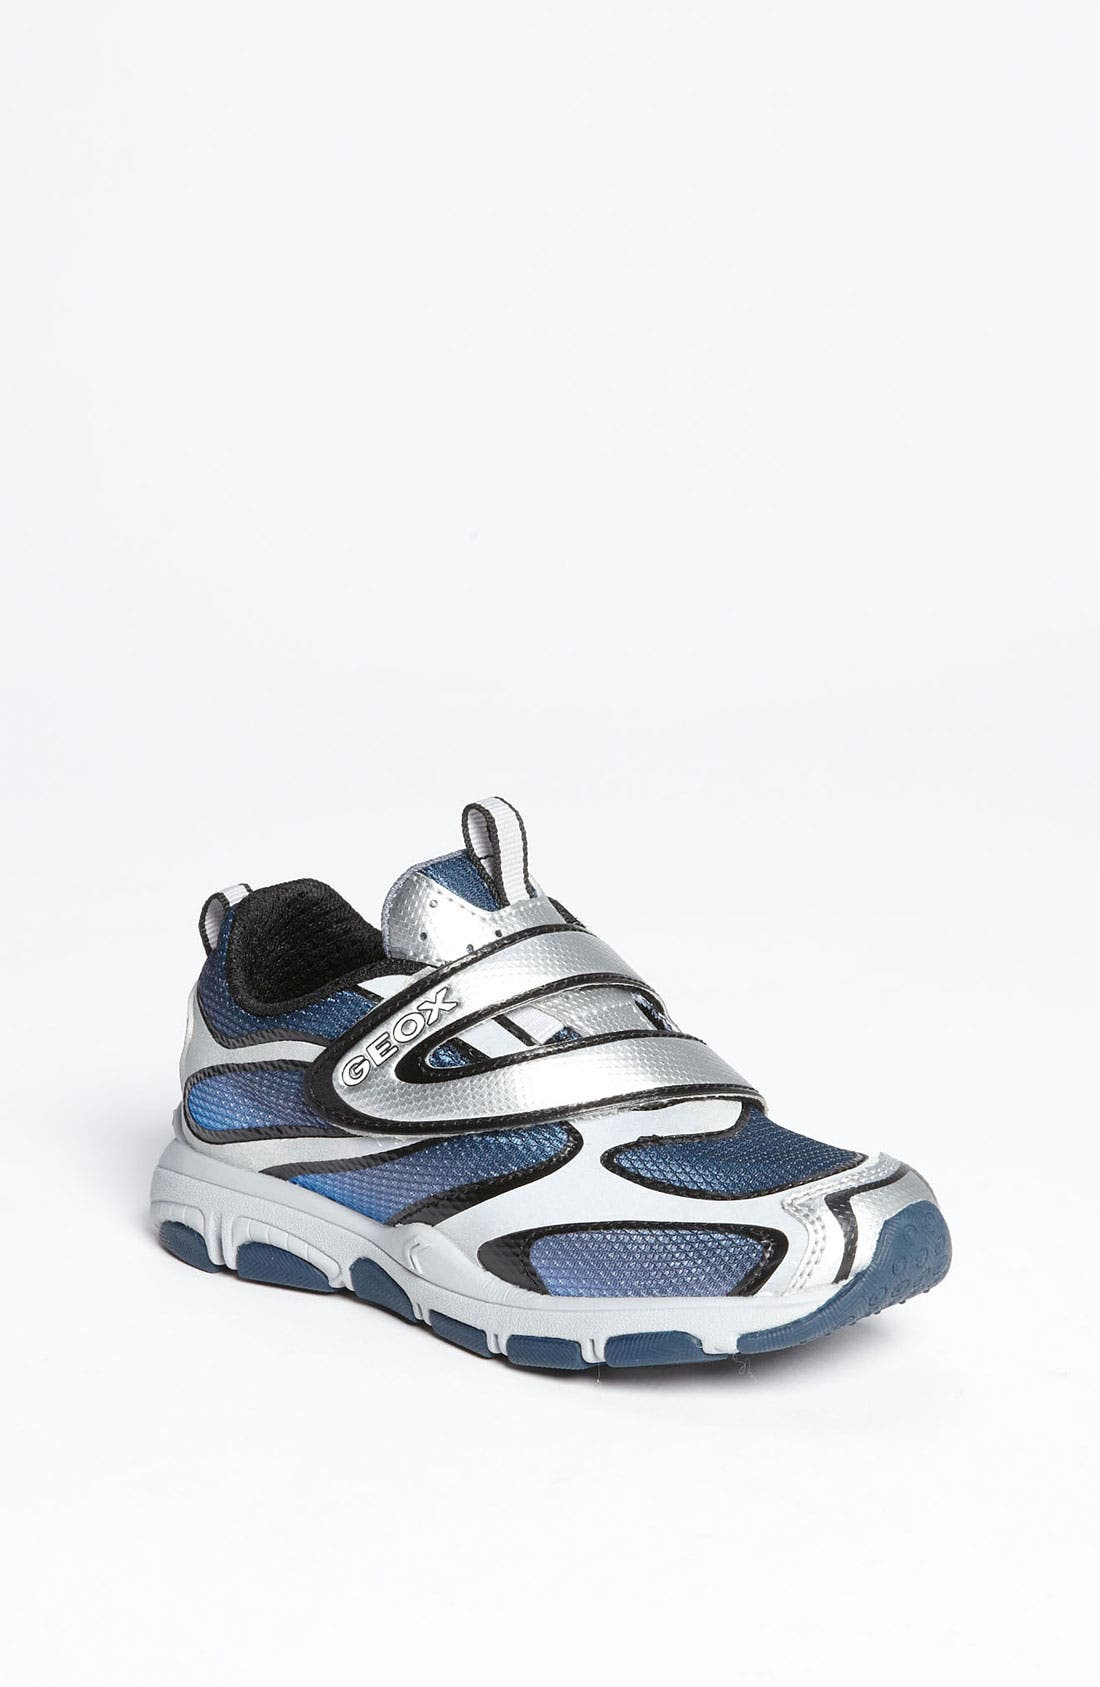 Alternate Image 1 Selected - Geox 'J Torque' Sneaker (Toddler & Little Kid)